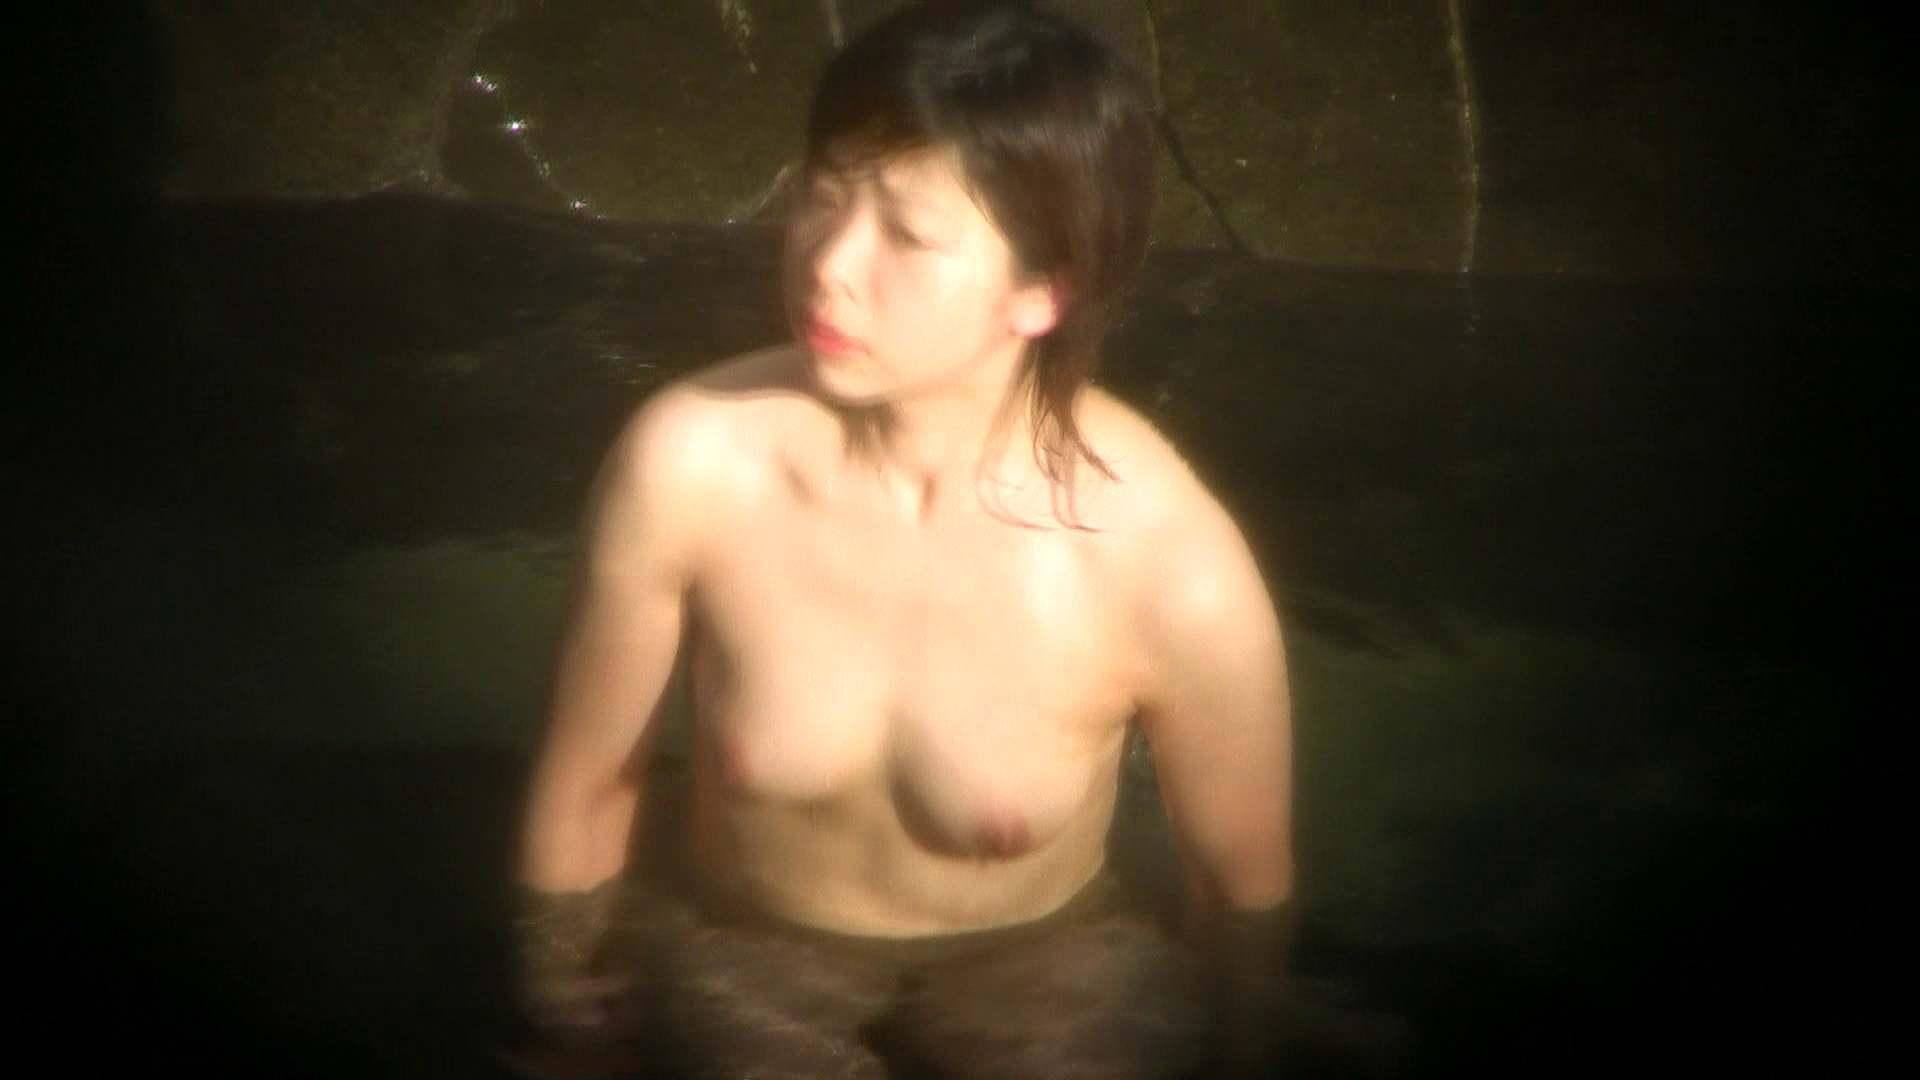 高画質露天女風呂観察 vol.005 望遠 えろ無修正画像 39連発 15